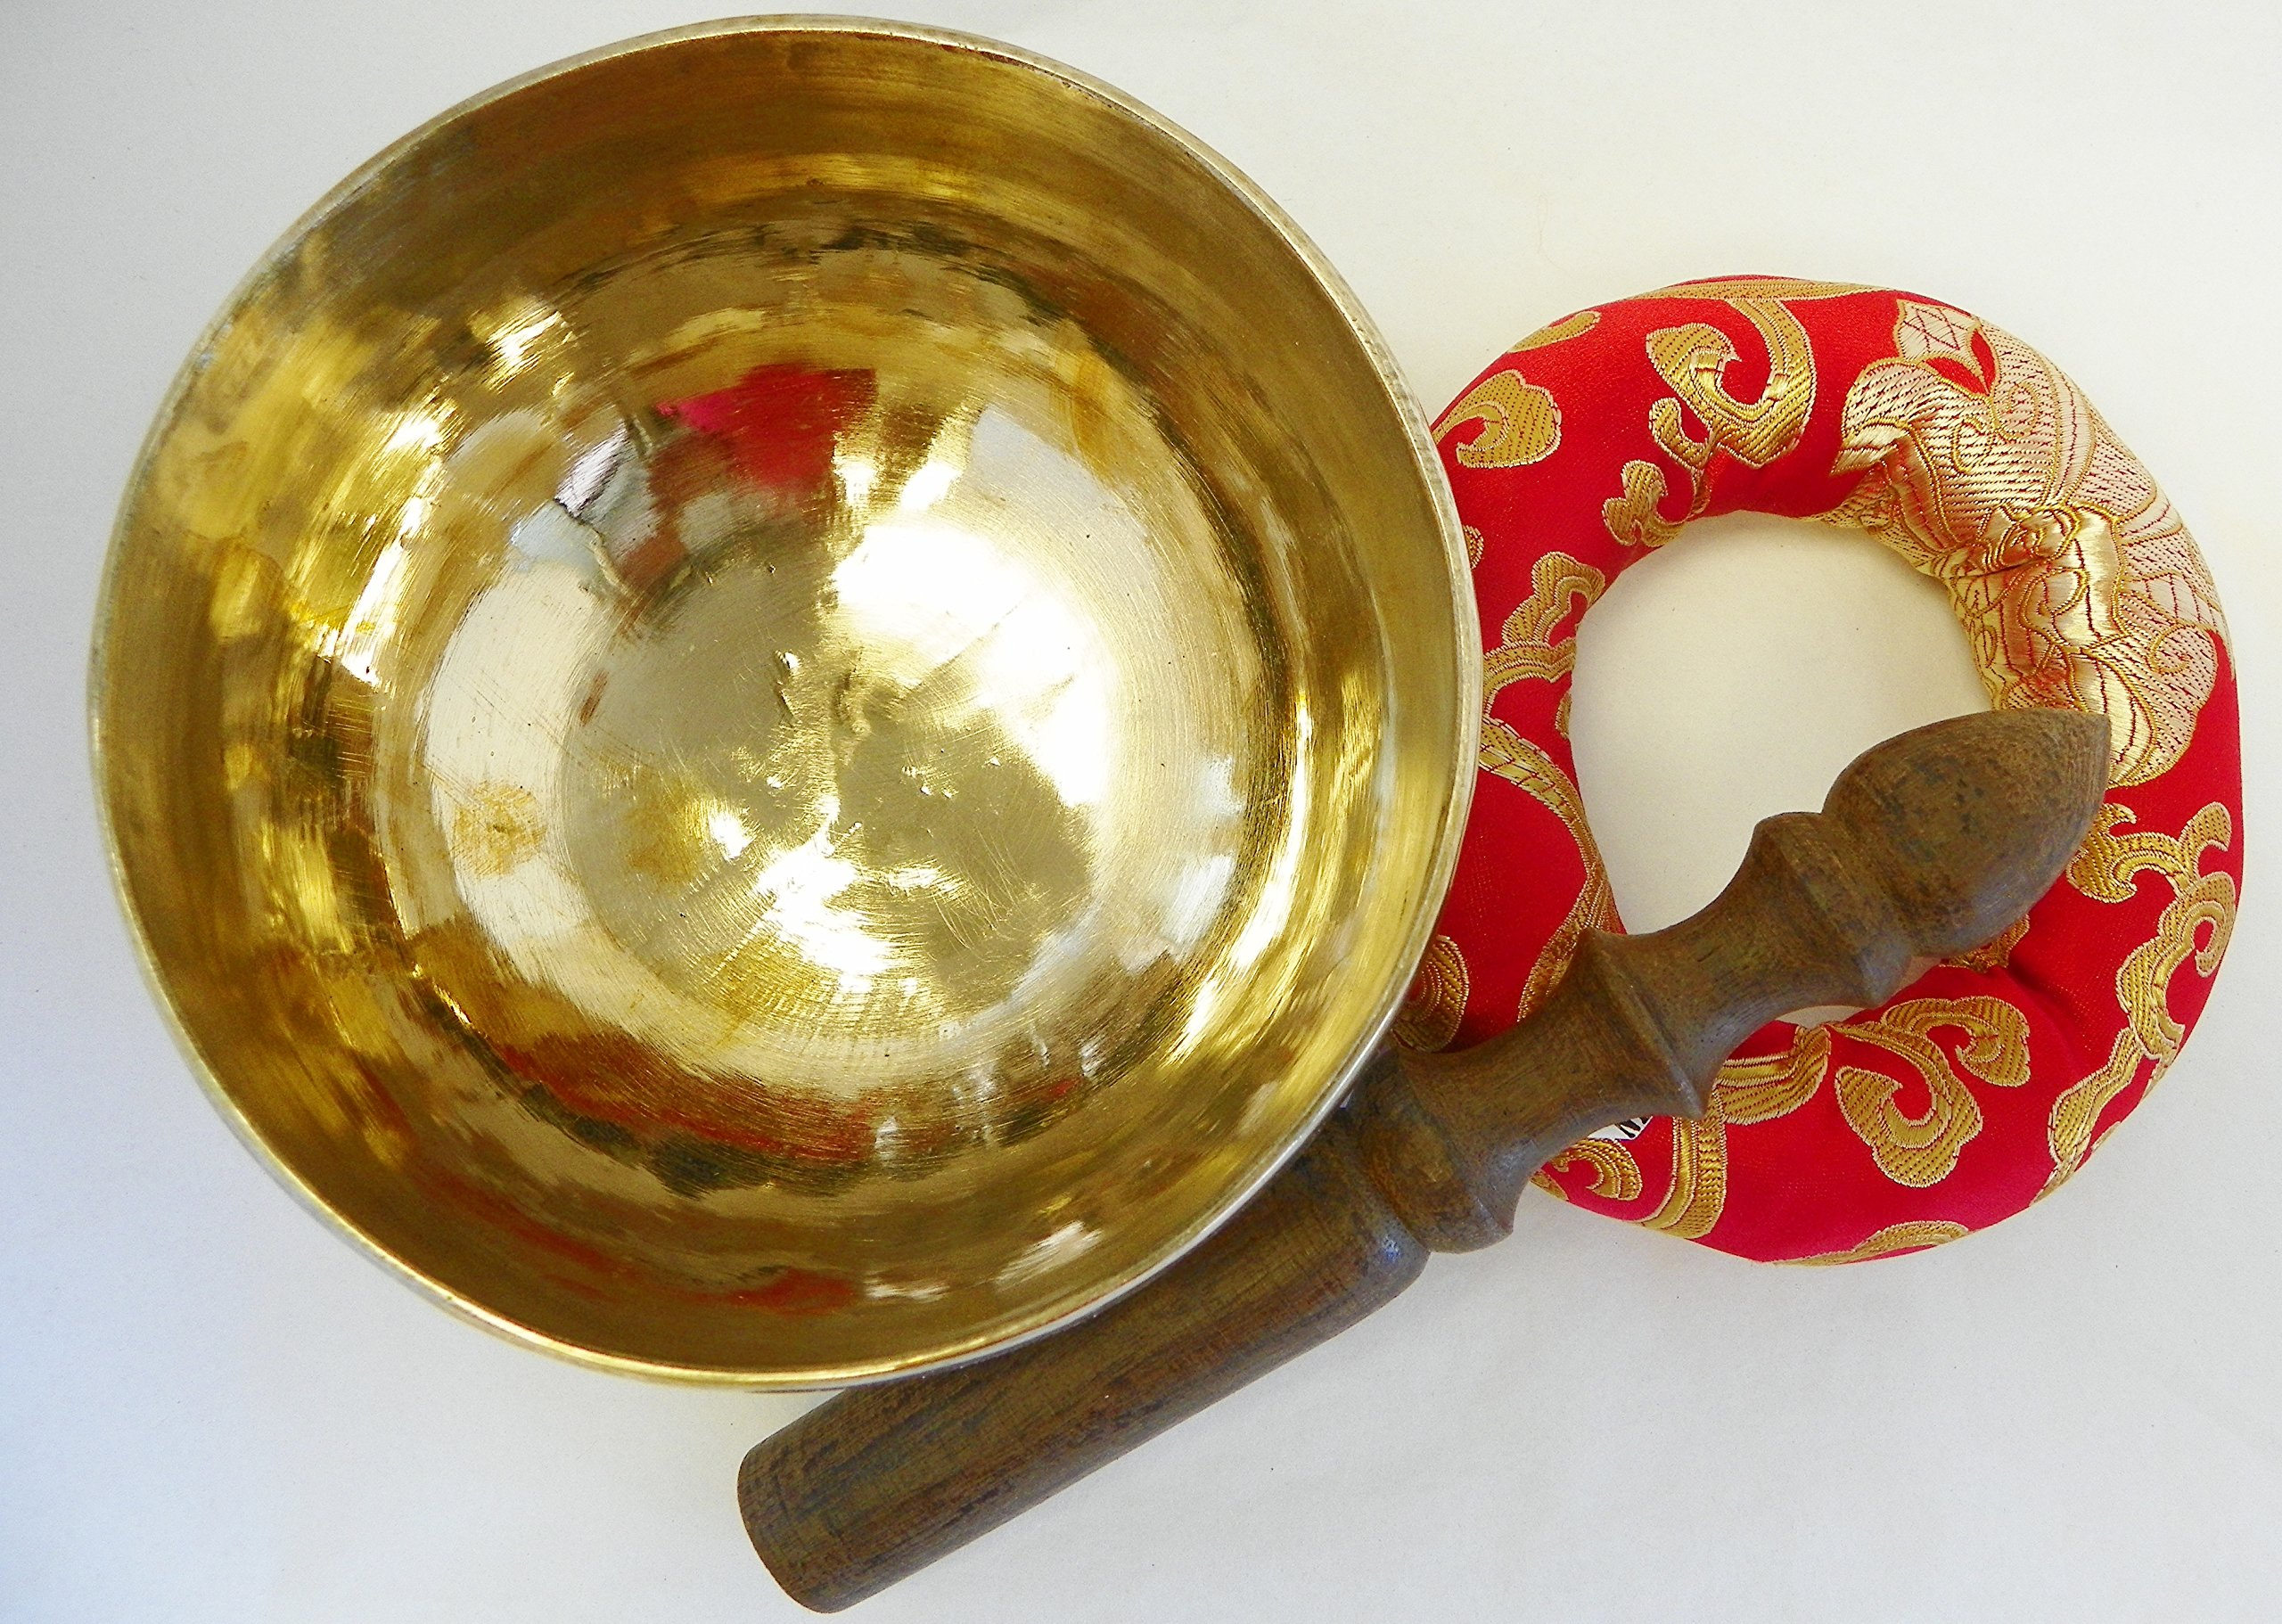 bowlsofnepal F547N 5.0 Palm Size Energetic Heart F Chakra Healing Tibetan Singing Bowl Made in Nepal